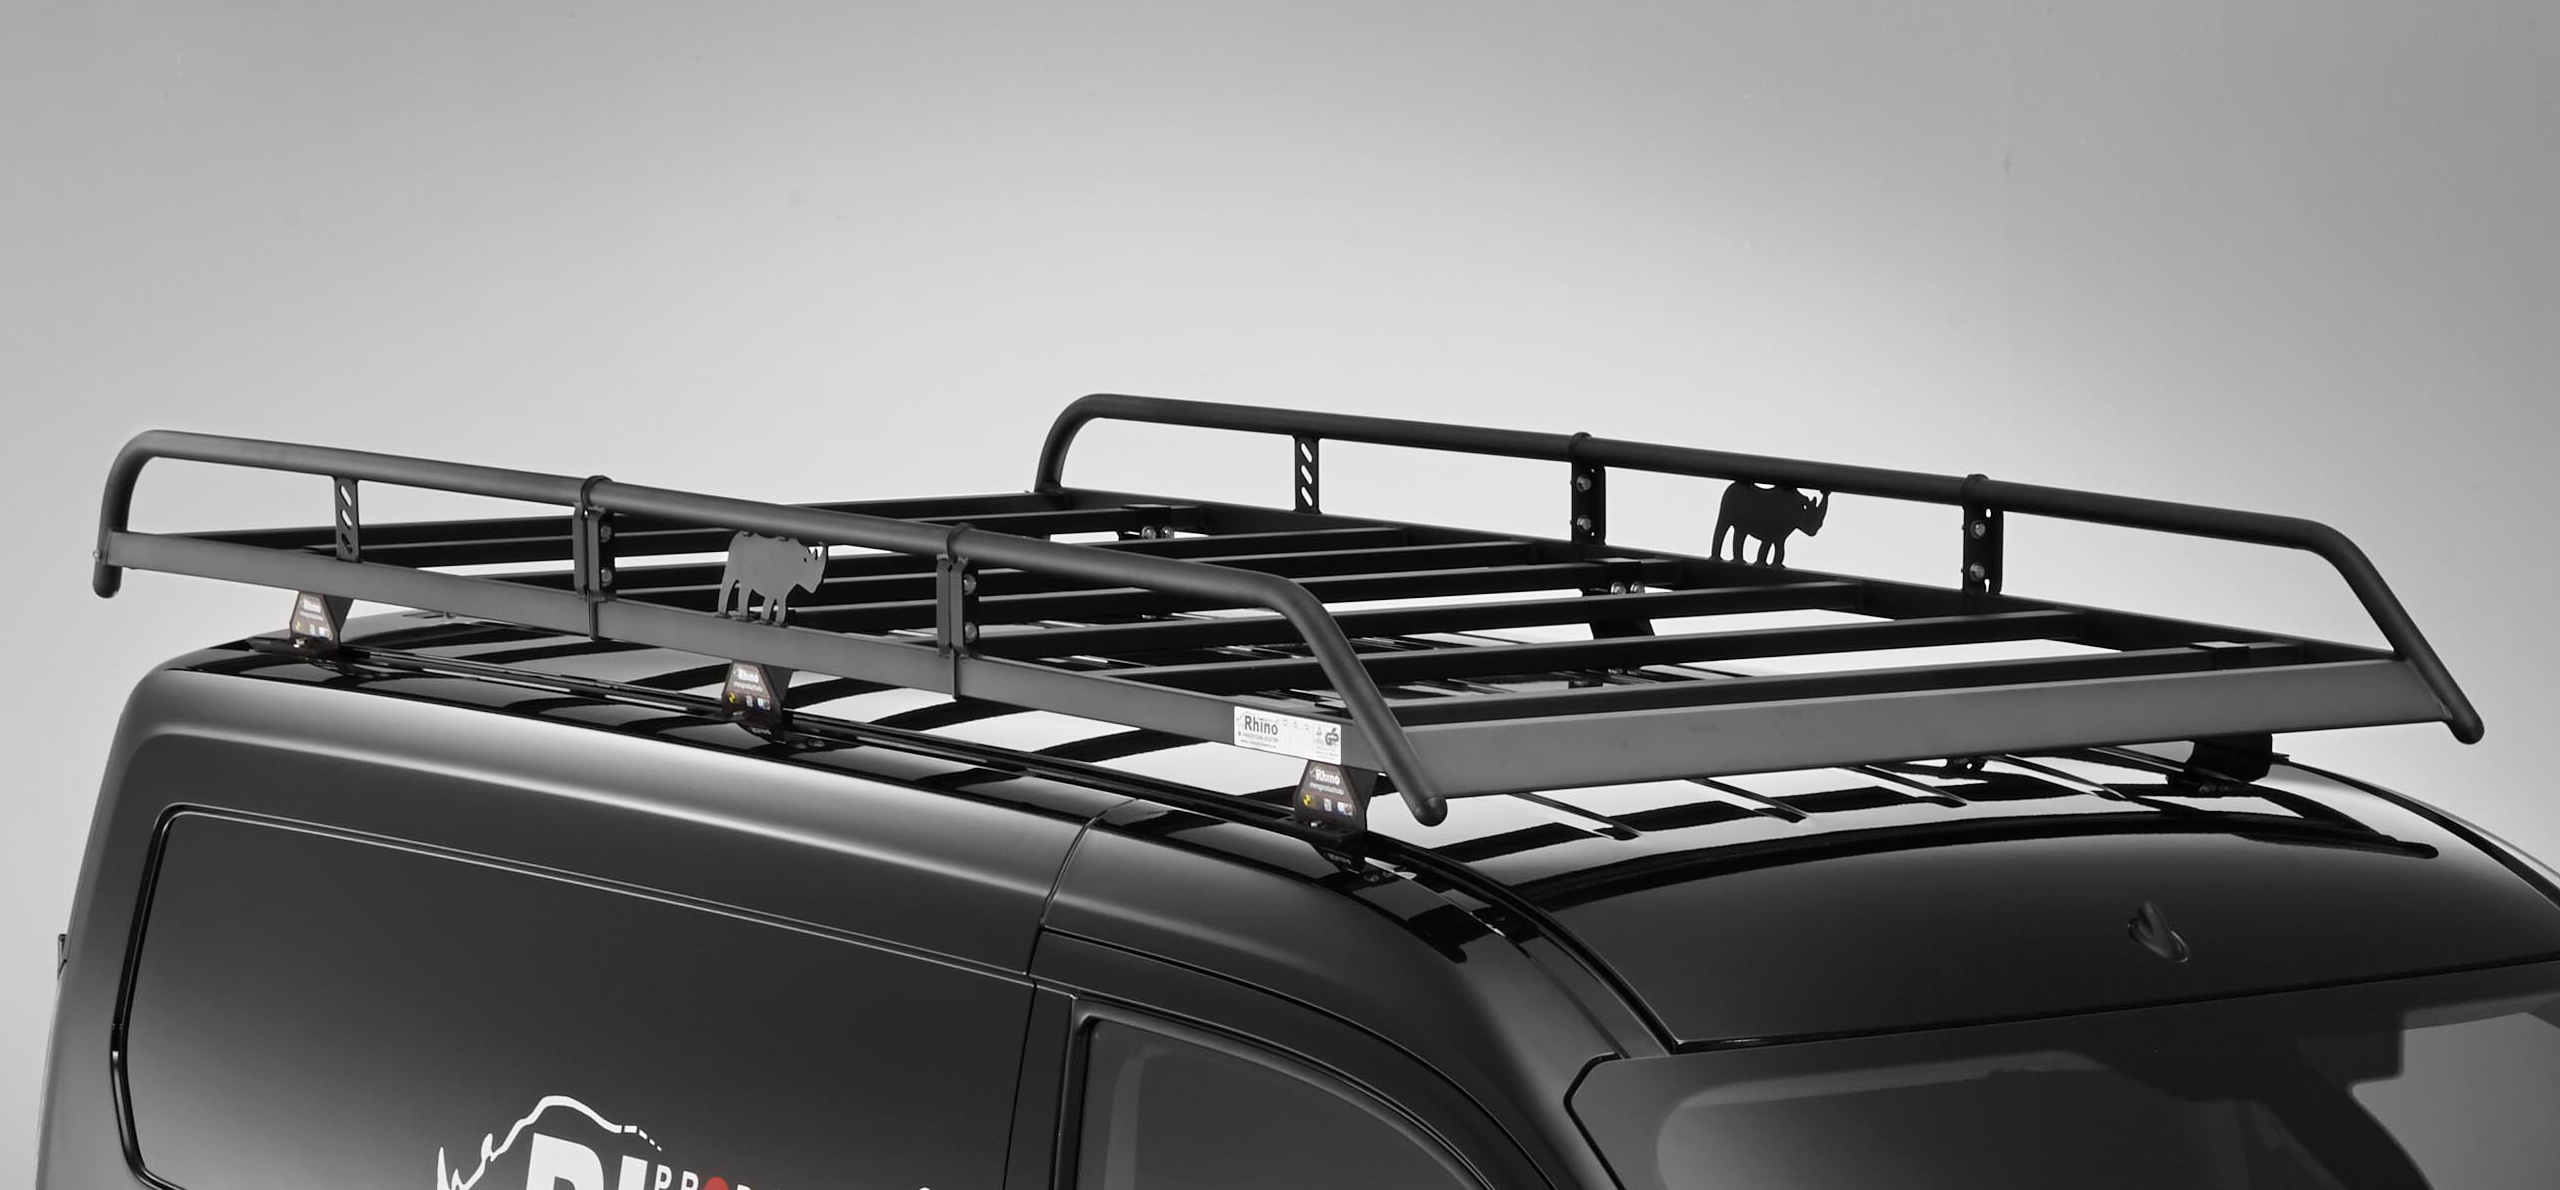 Rhino Modular Roof Rack For Ford Transit Custom 2013 On Swb Barn Doors Ebay